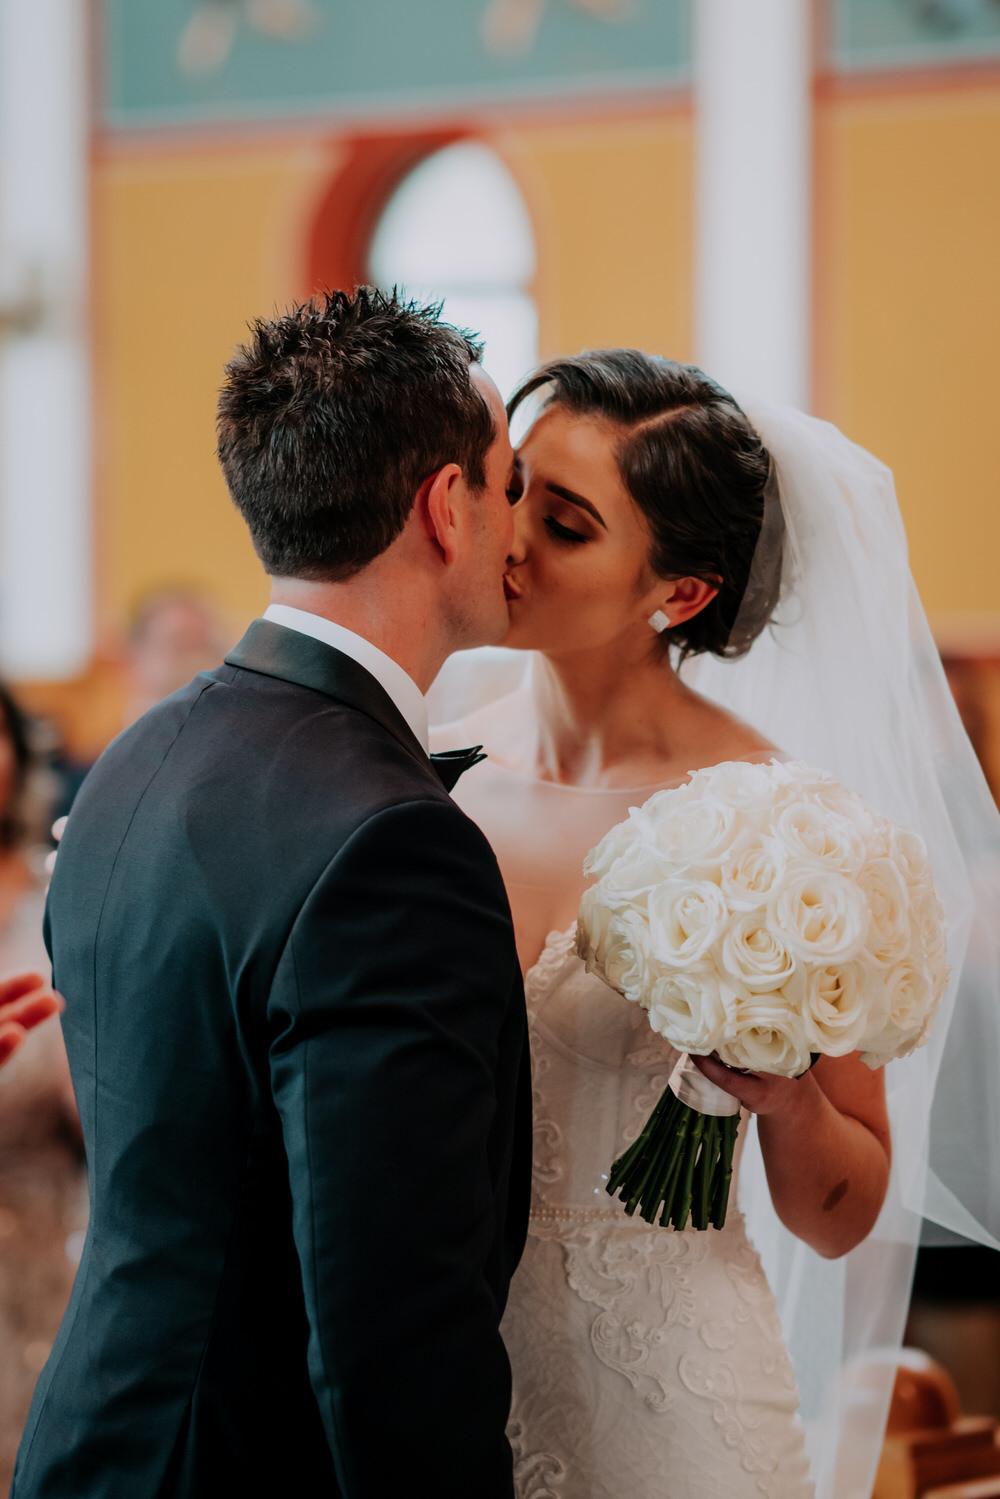 ava-me-photography-marina-daniel-sydney-liverpool-st-raphael-nicholas-irene-greek-orthodox-church-bradleys-head-wedding-00438